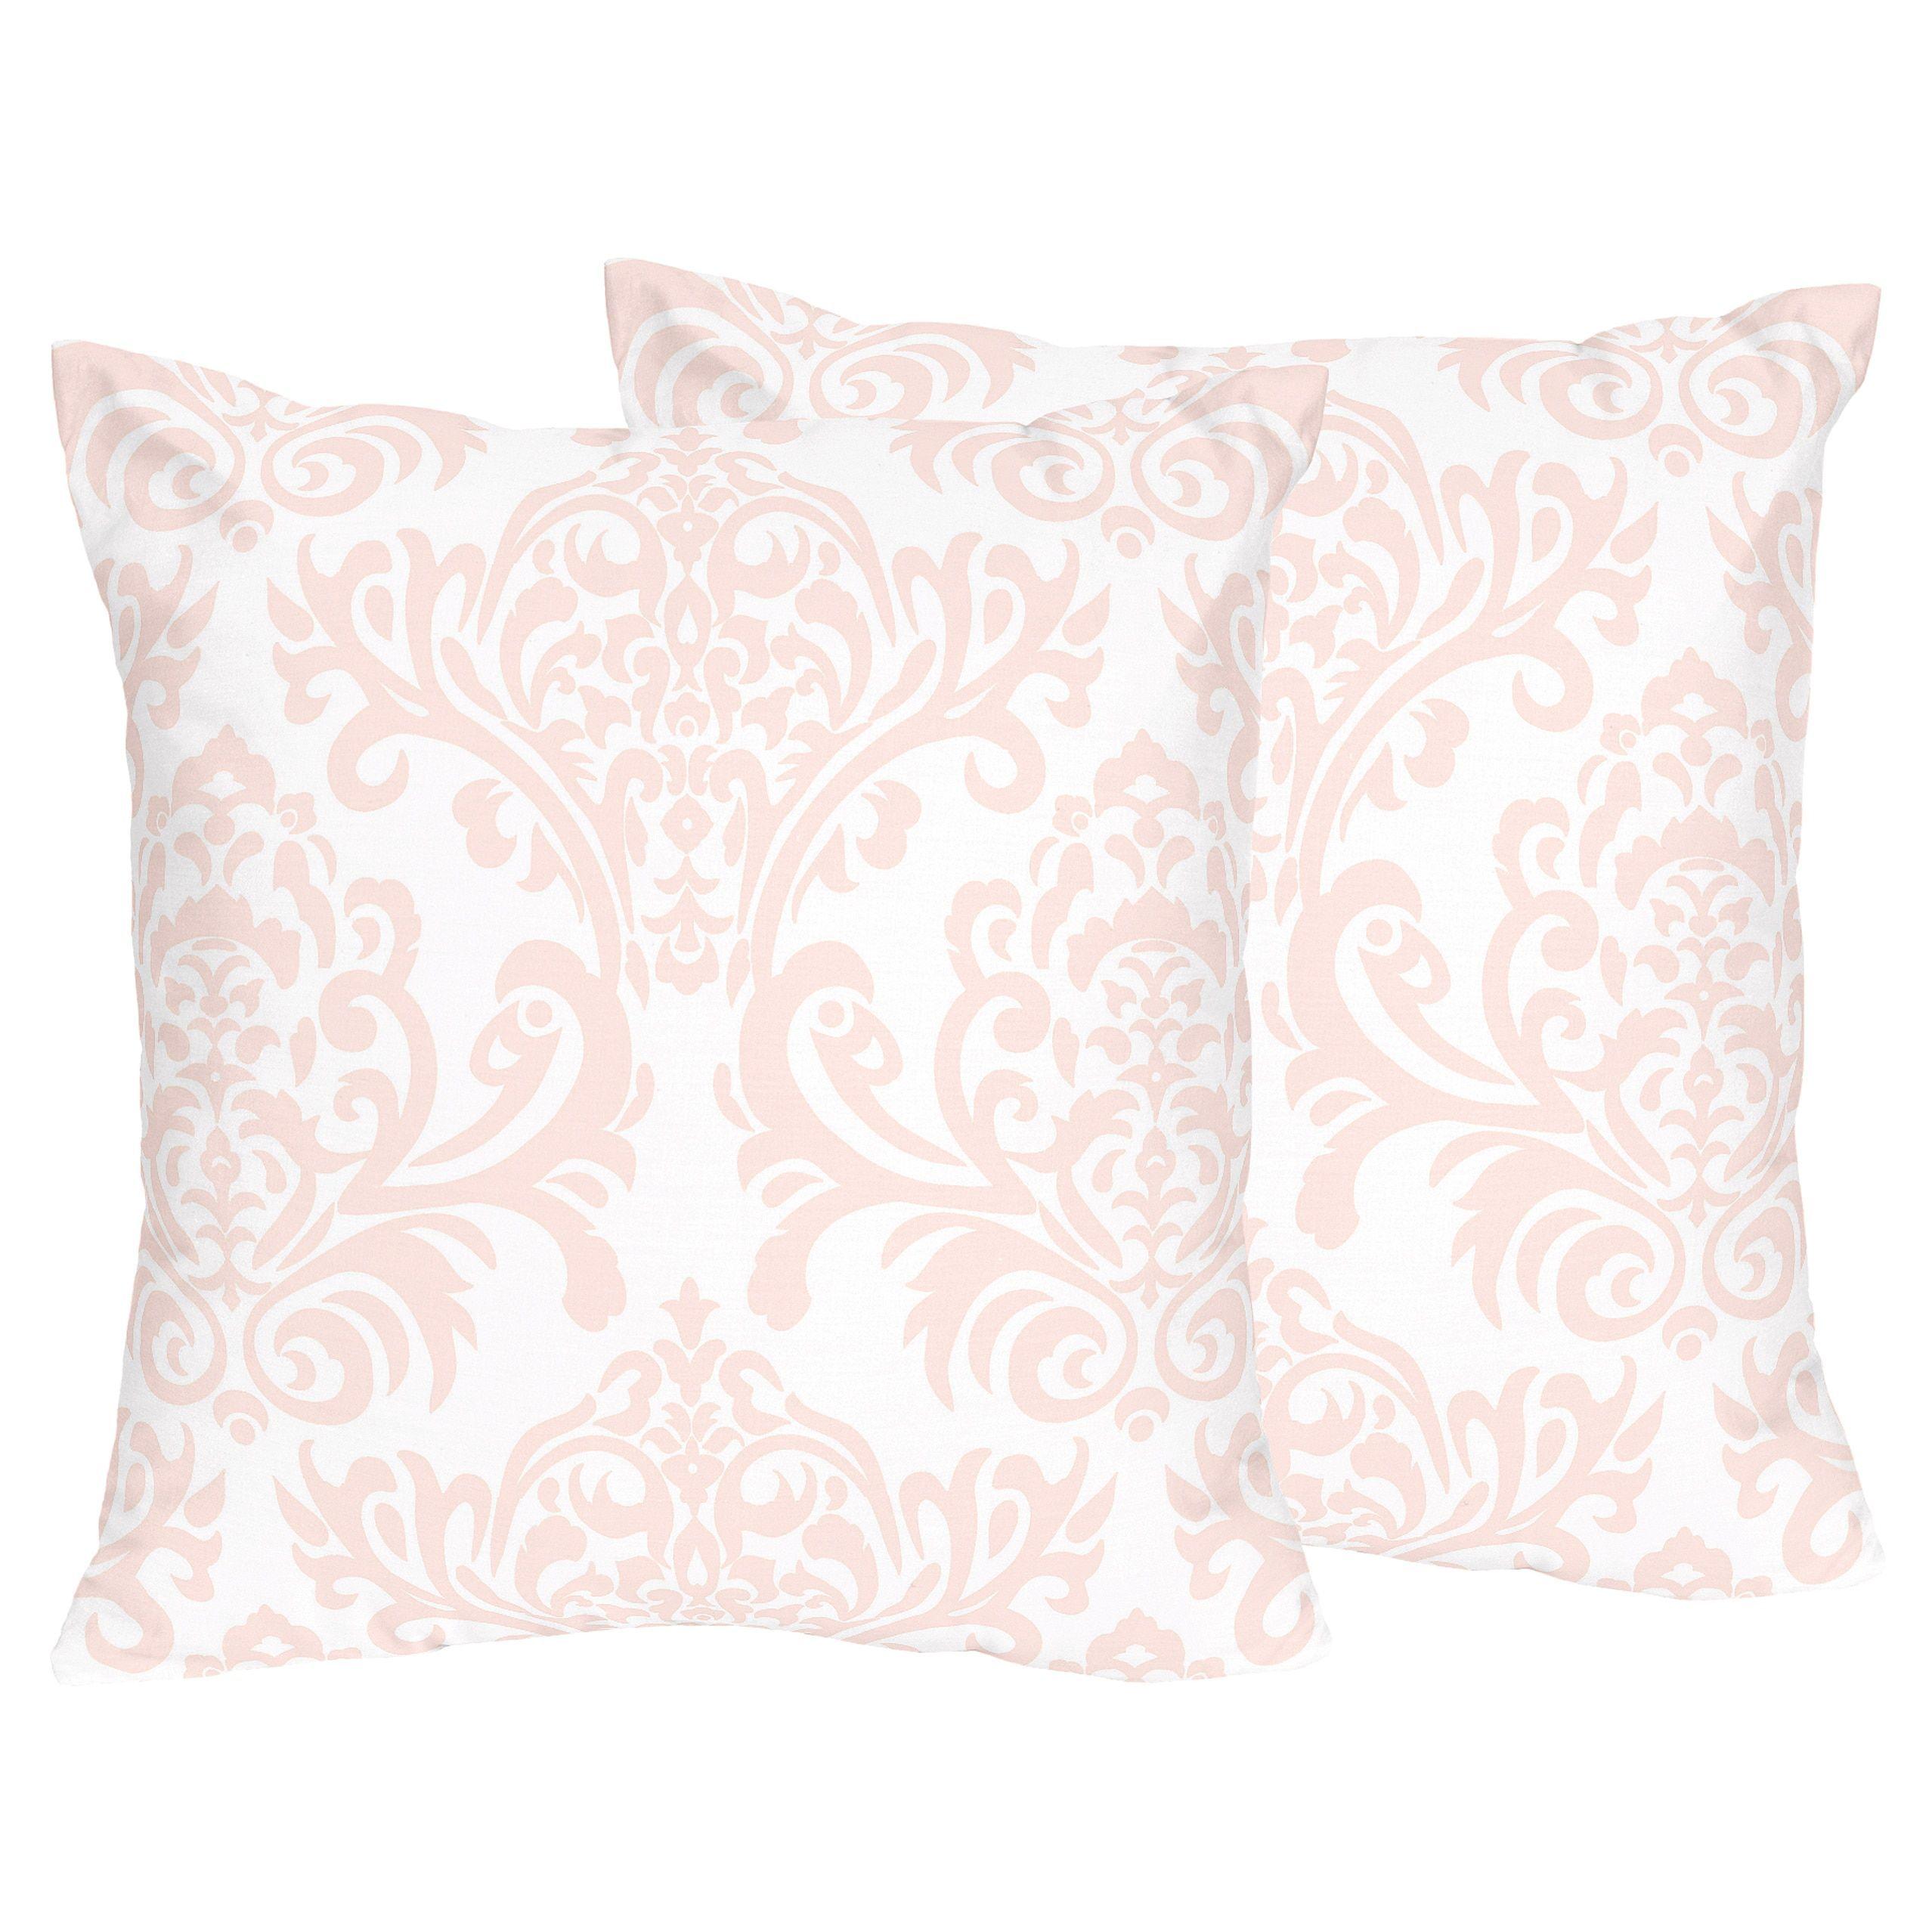 Sweet Jojo Designs Amelia Collection Pinkwhite Damask Print 18 Inch Accent